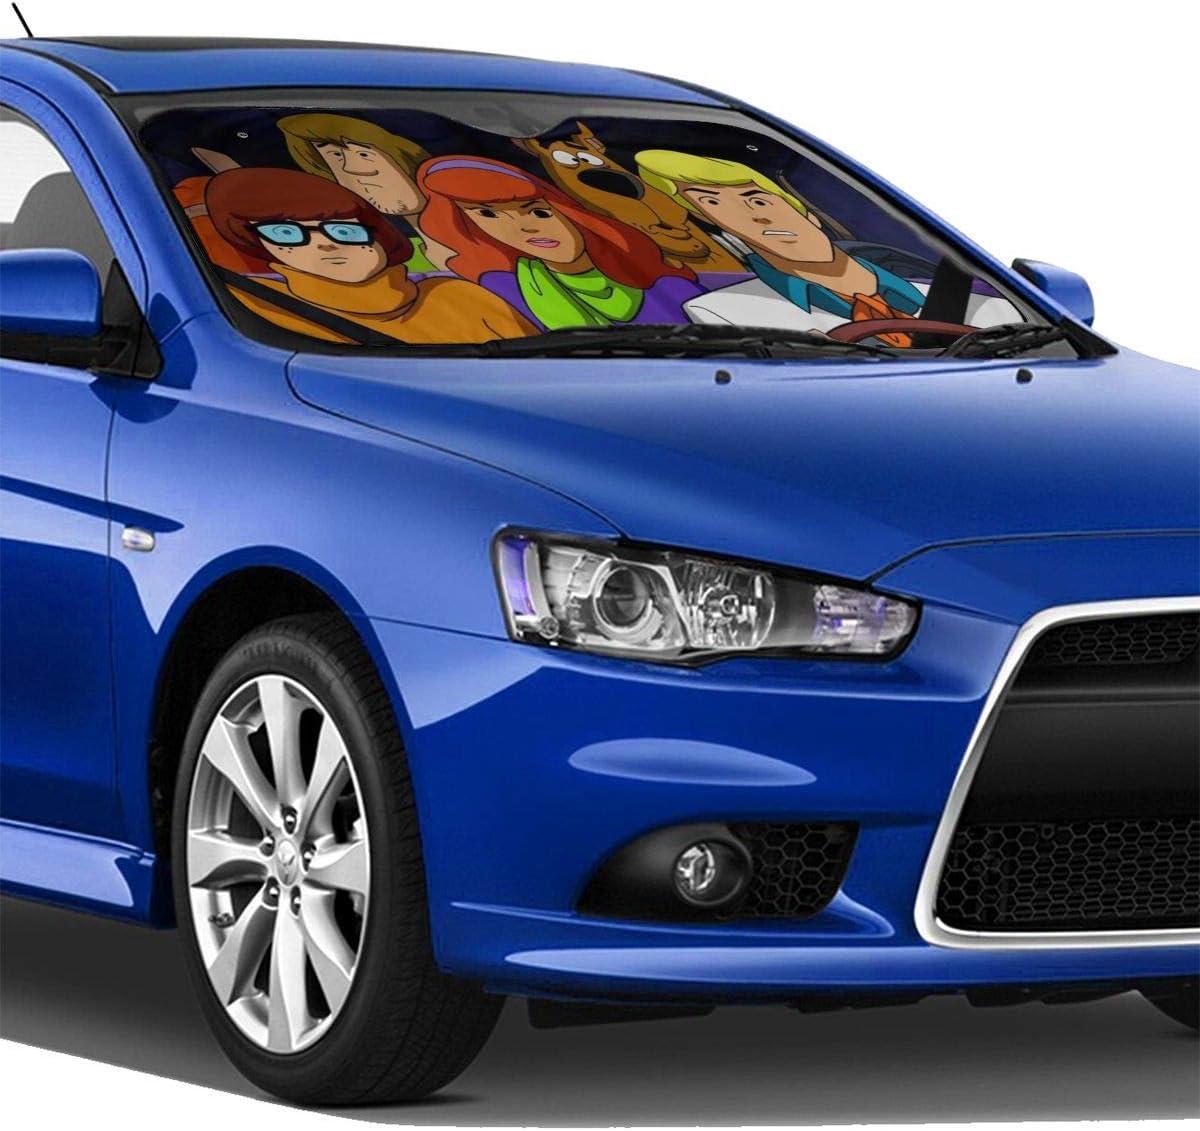 KOPDSE Scooby Doo Windshield Sun Shade Sunshades Keep Vehicle Cool Protect Your Car from Sun Heat UV Ray Visor Protector